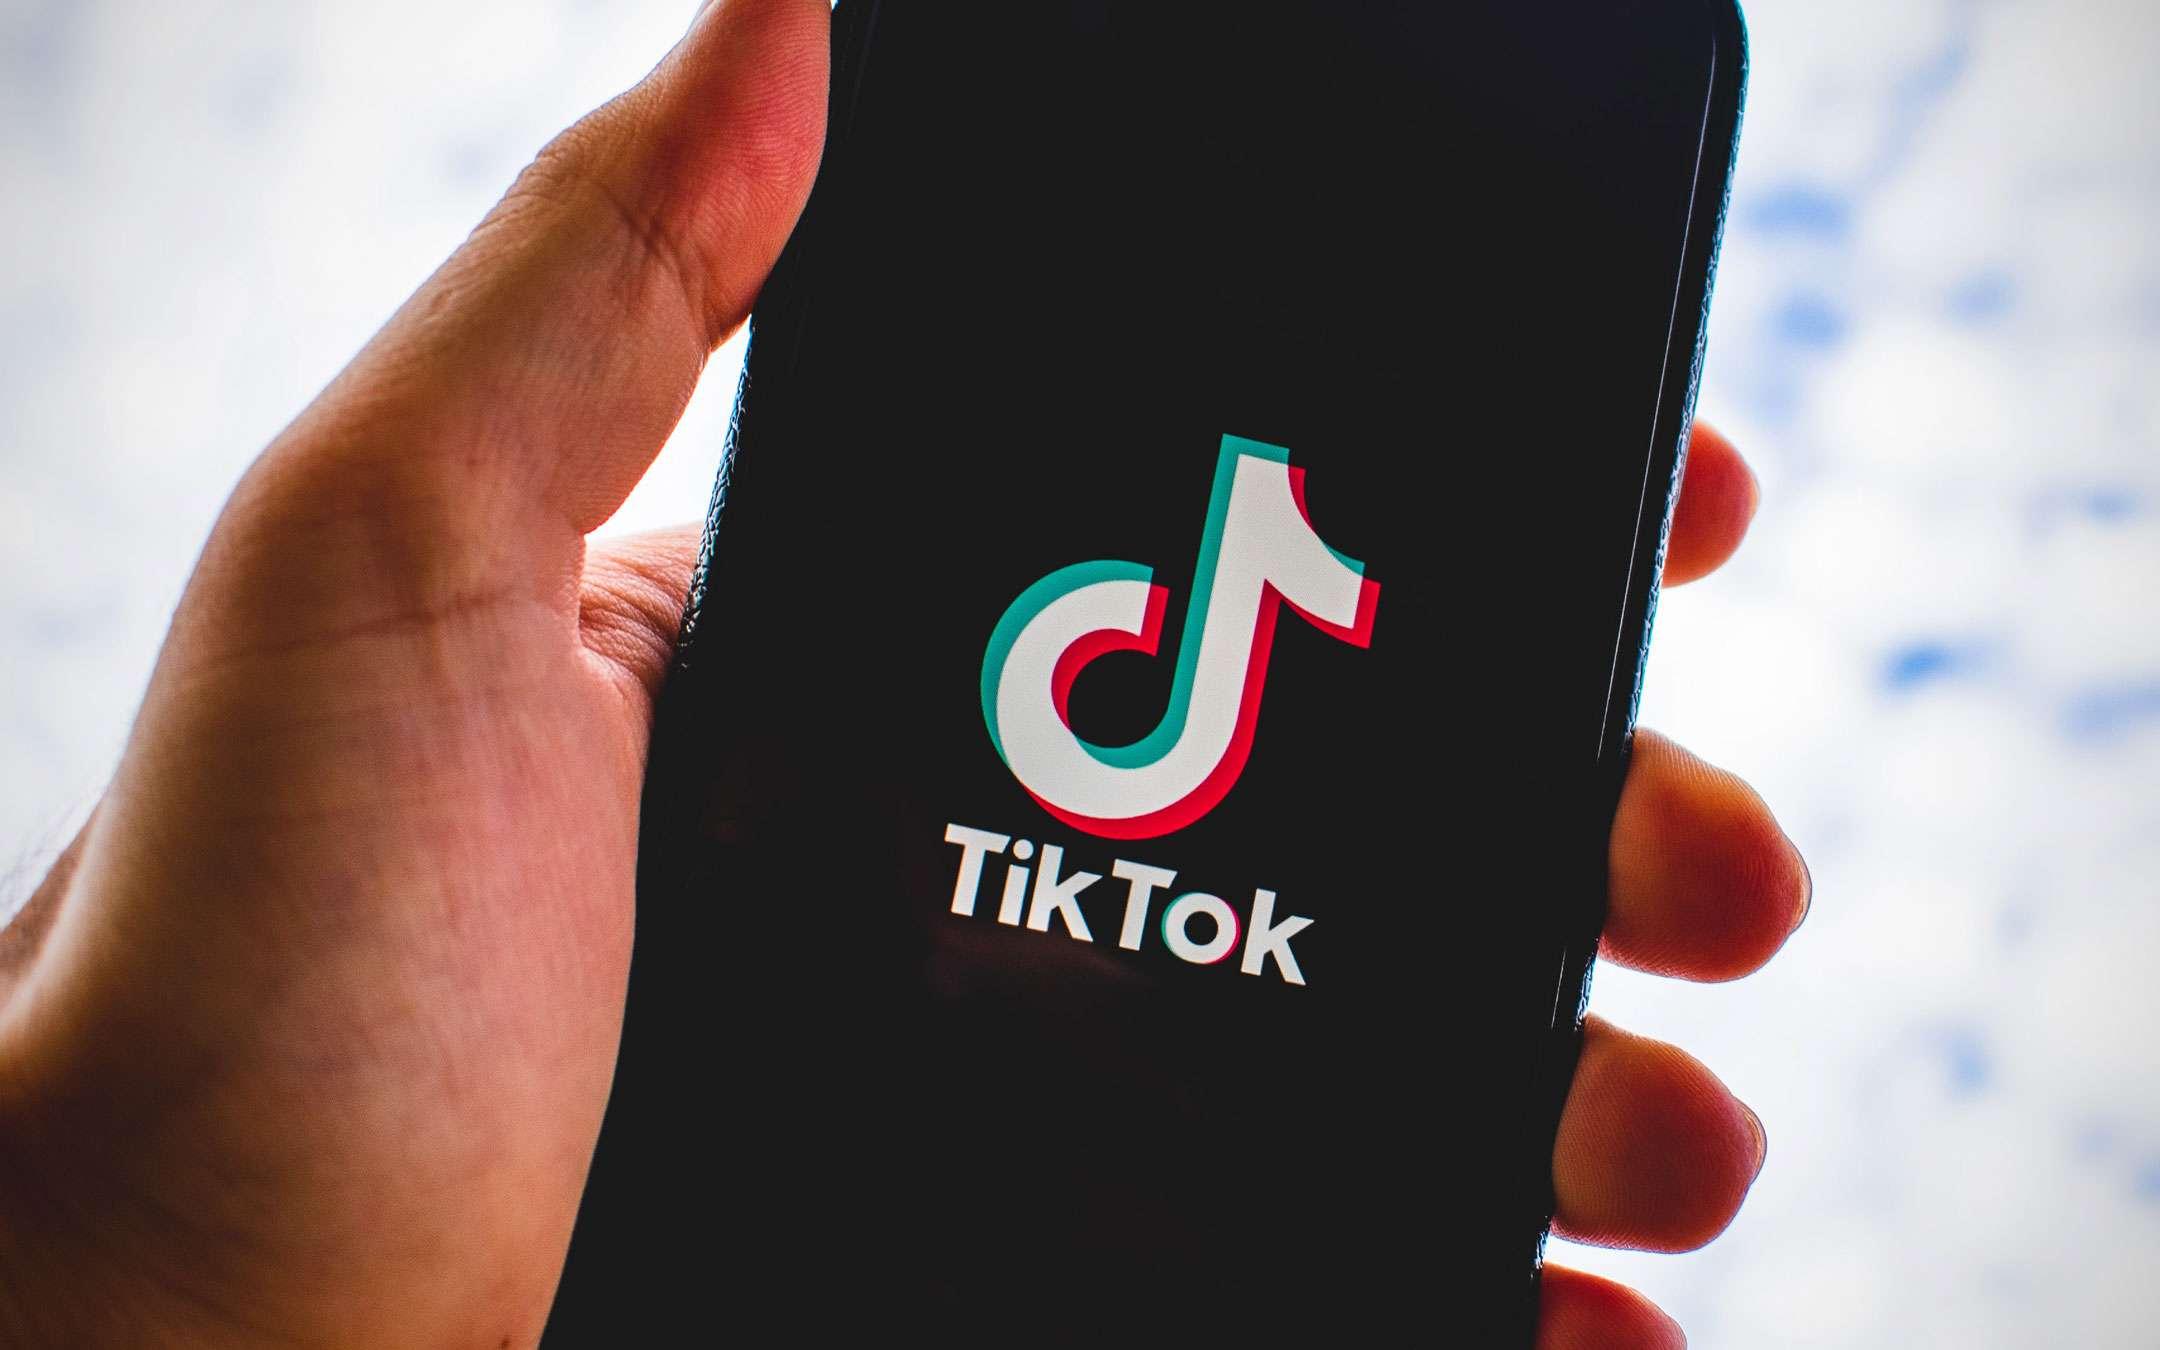 Gates on Microsoft-TikTok: poisoned chalice